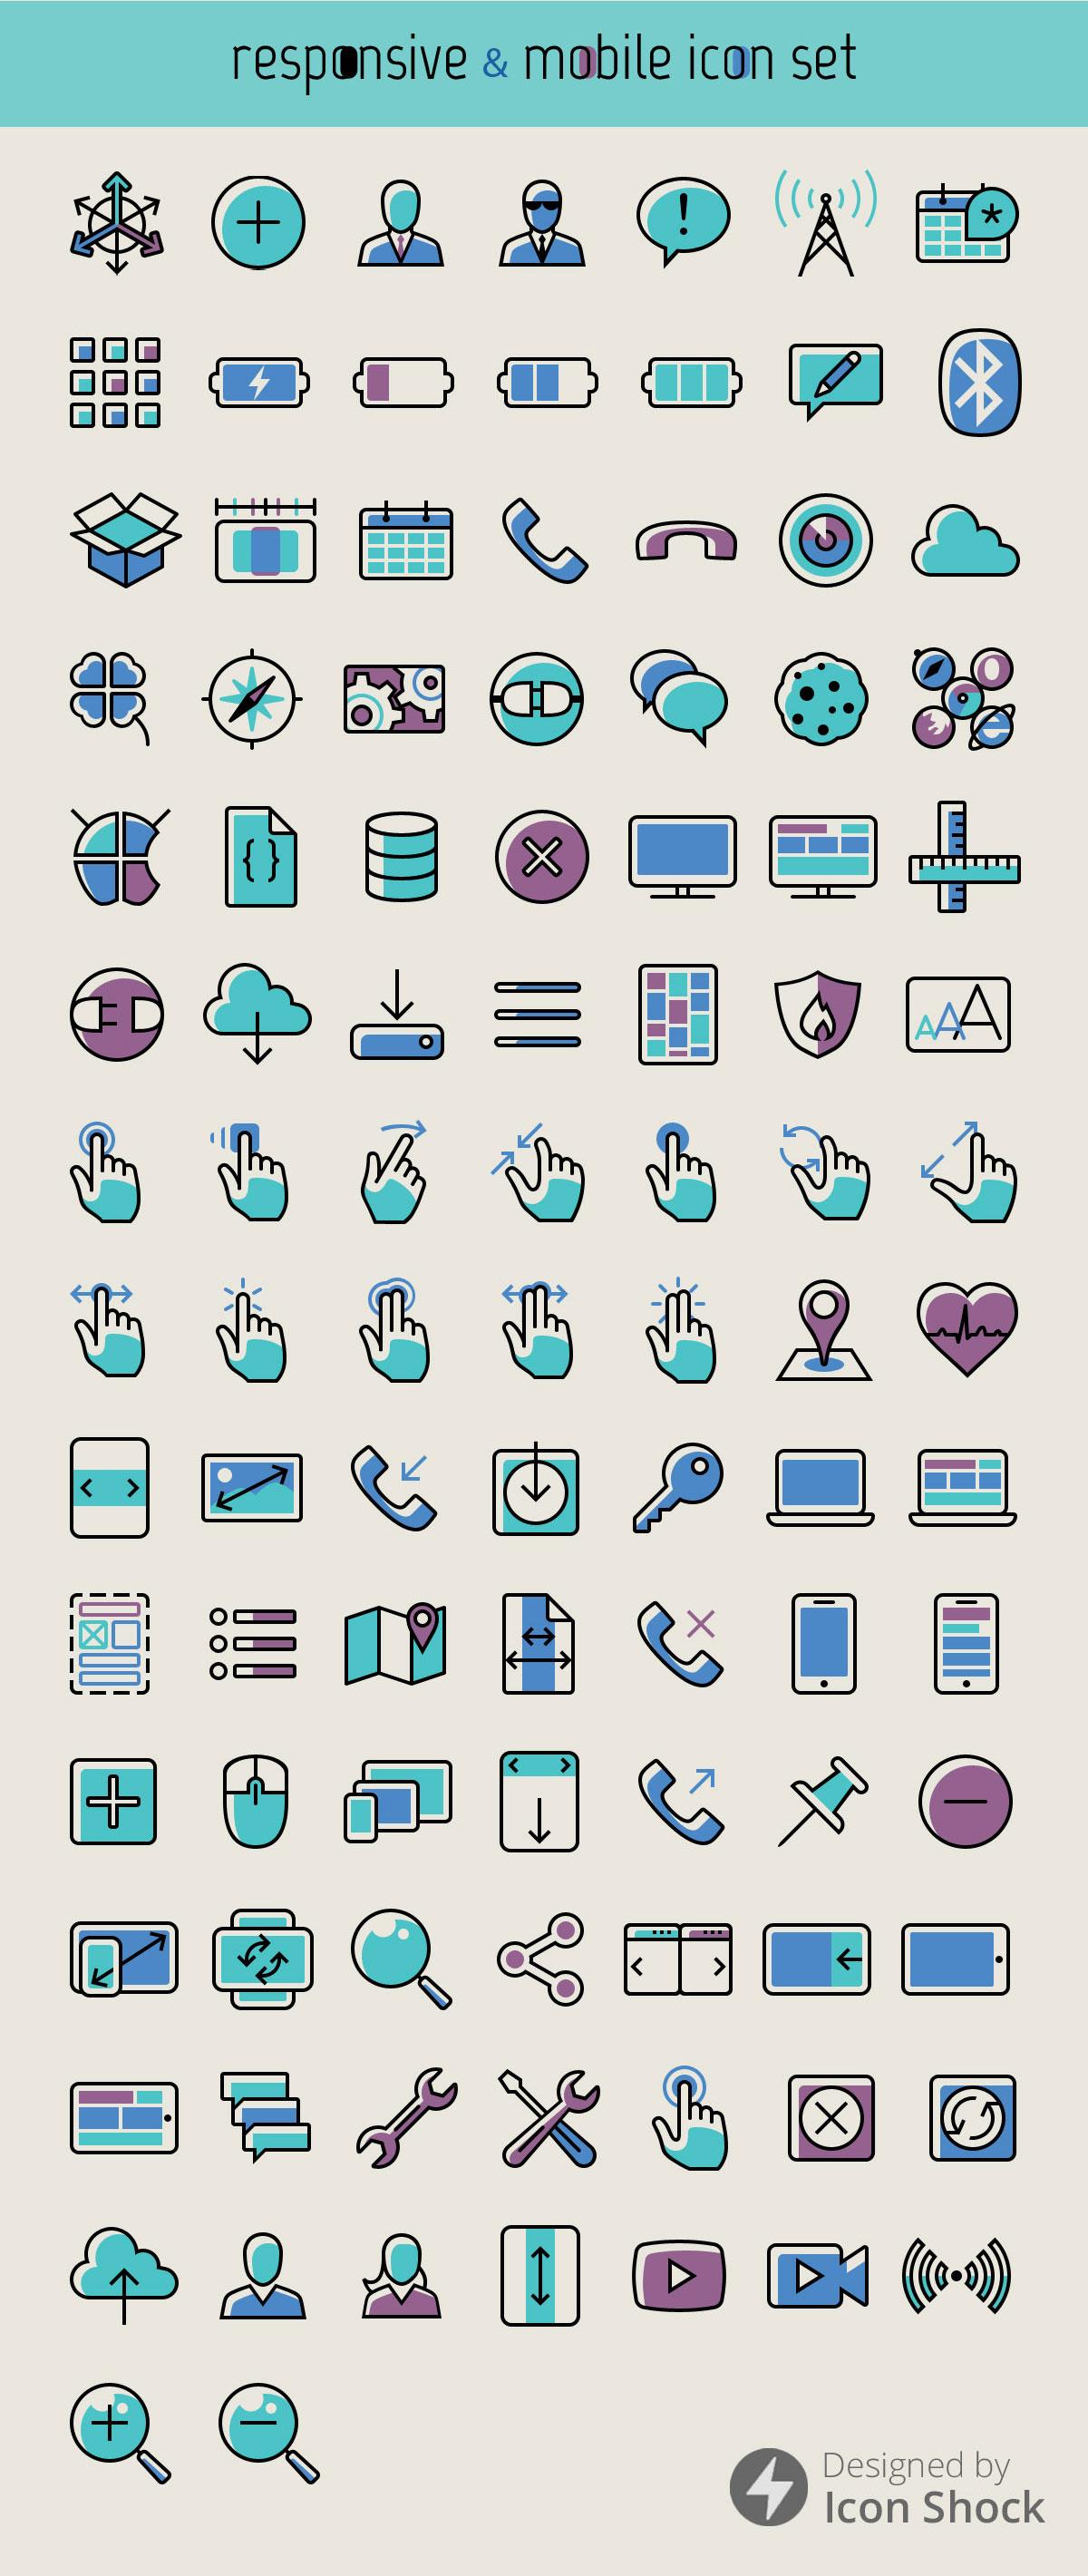 100-responsive-mobil-ikon-set-3